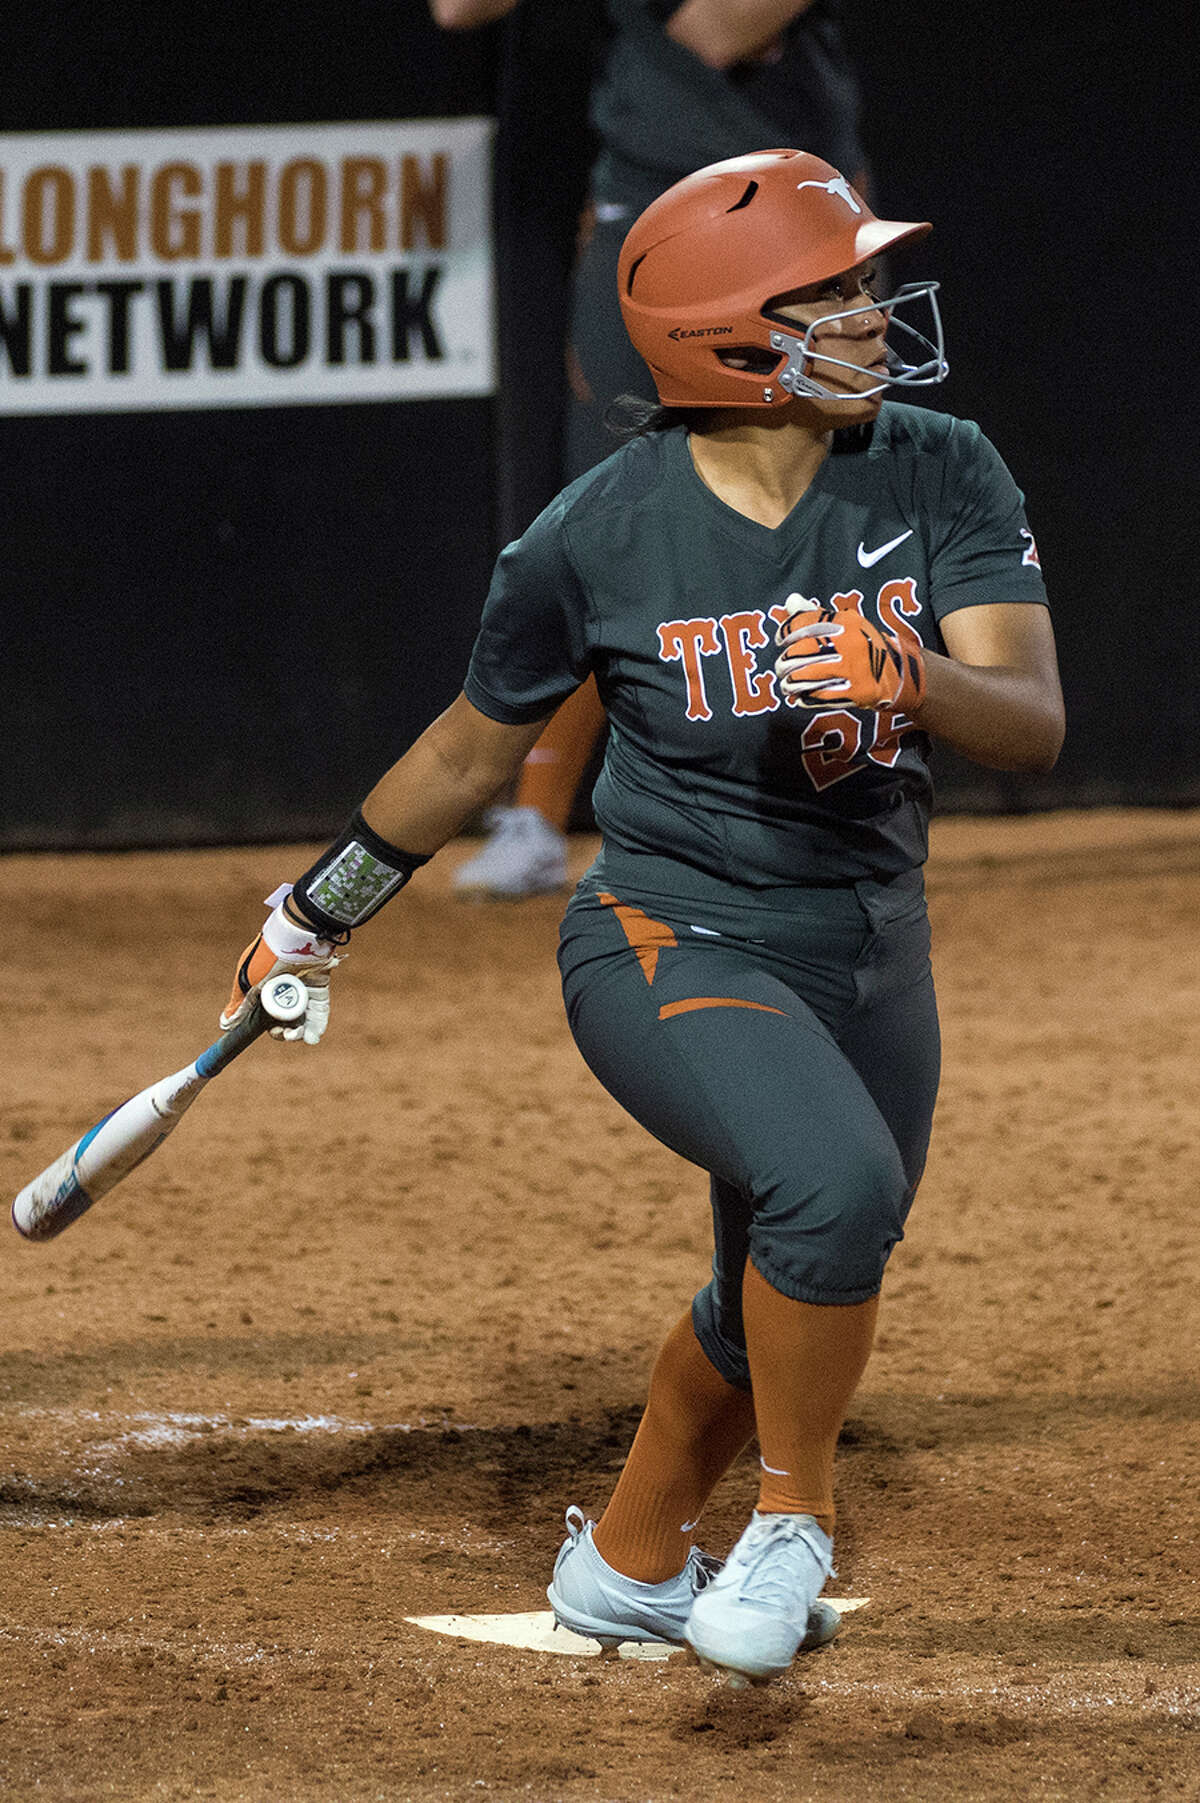 University of Texas softball player Kaitlyn Washington